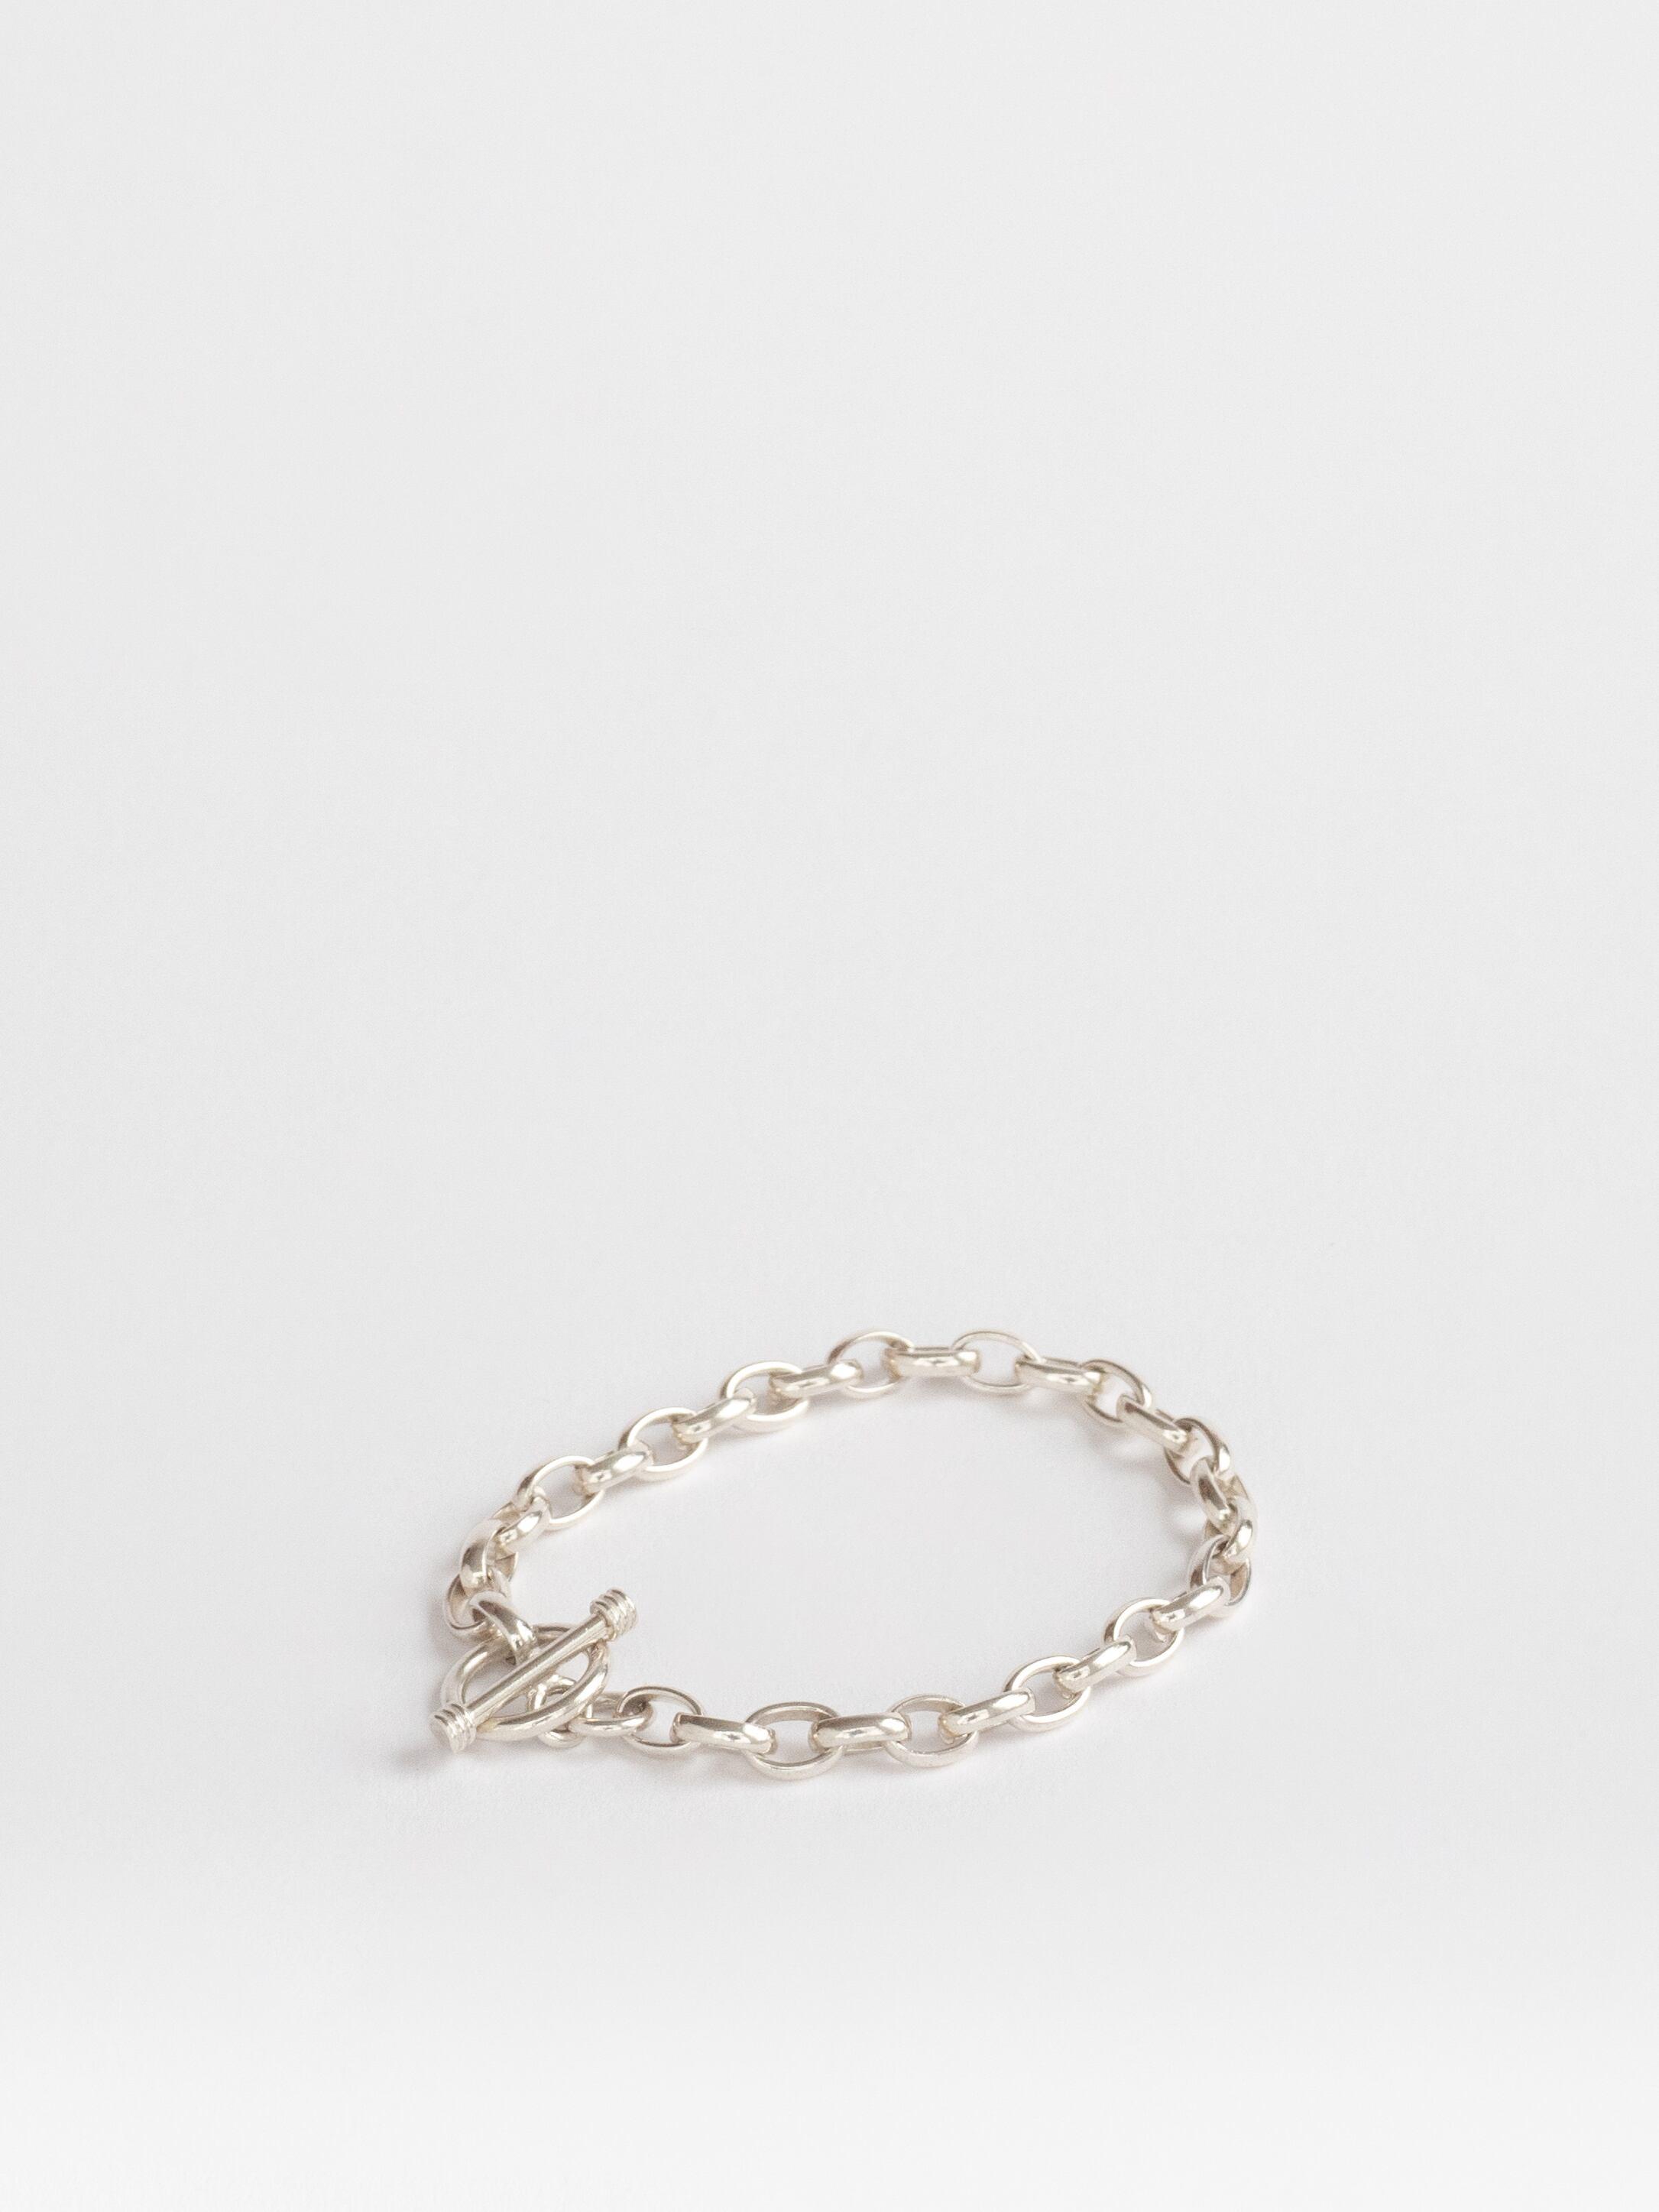 Oval Chain Bracelet / Mexico